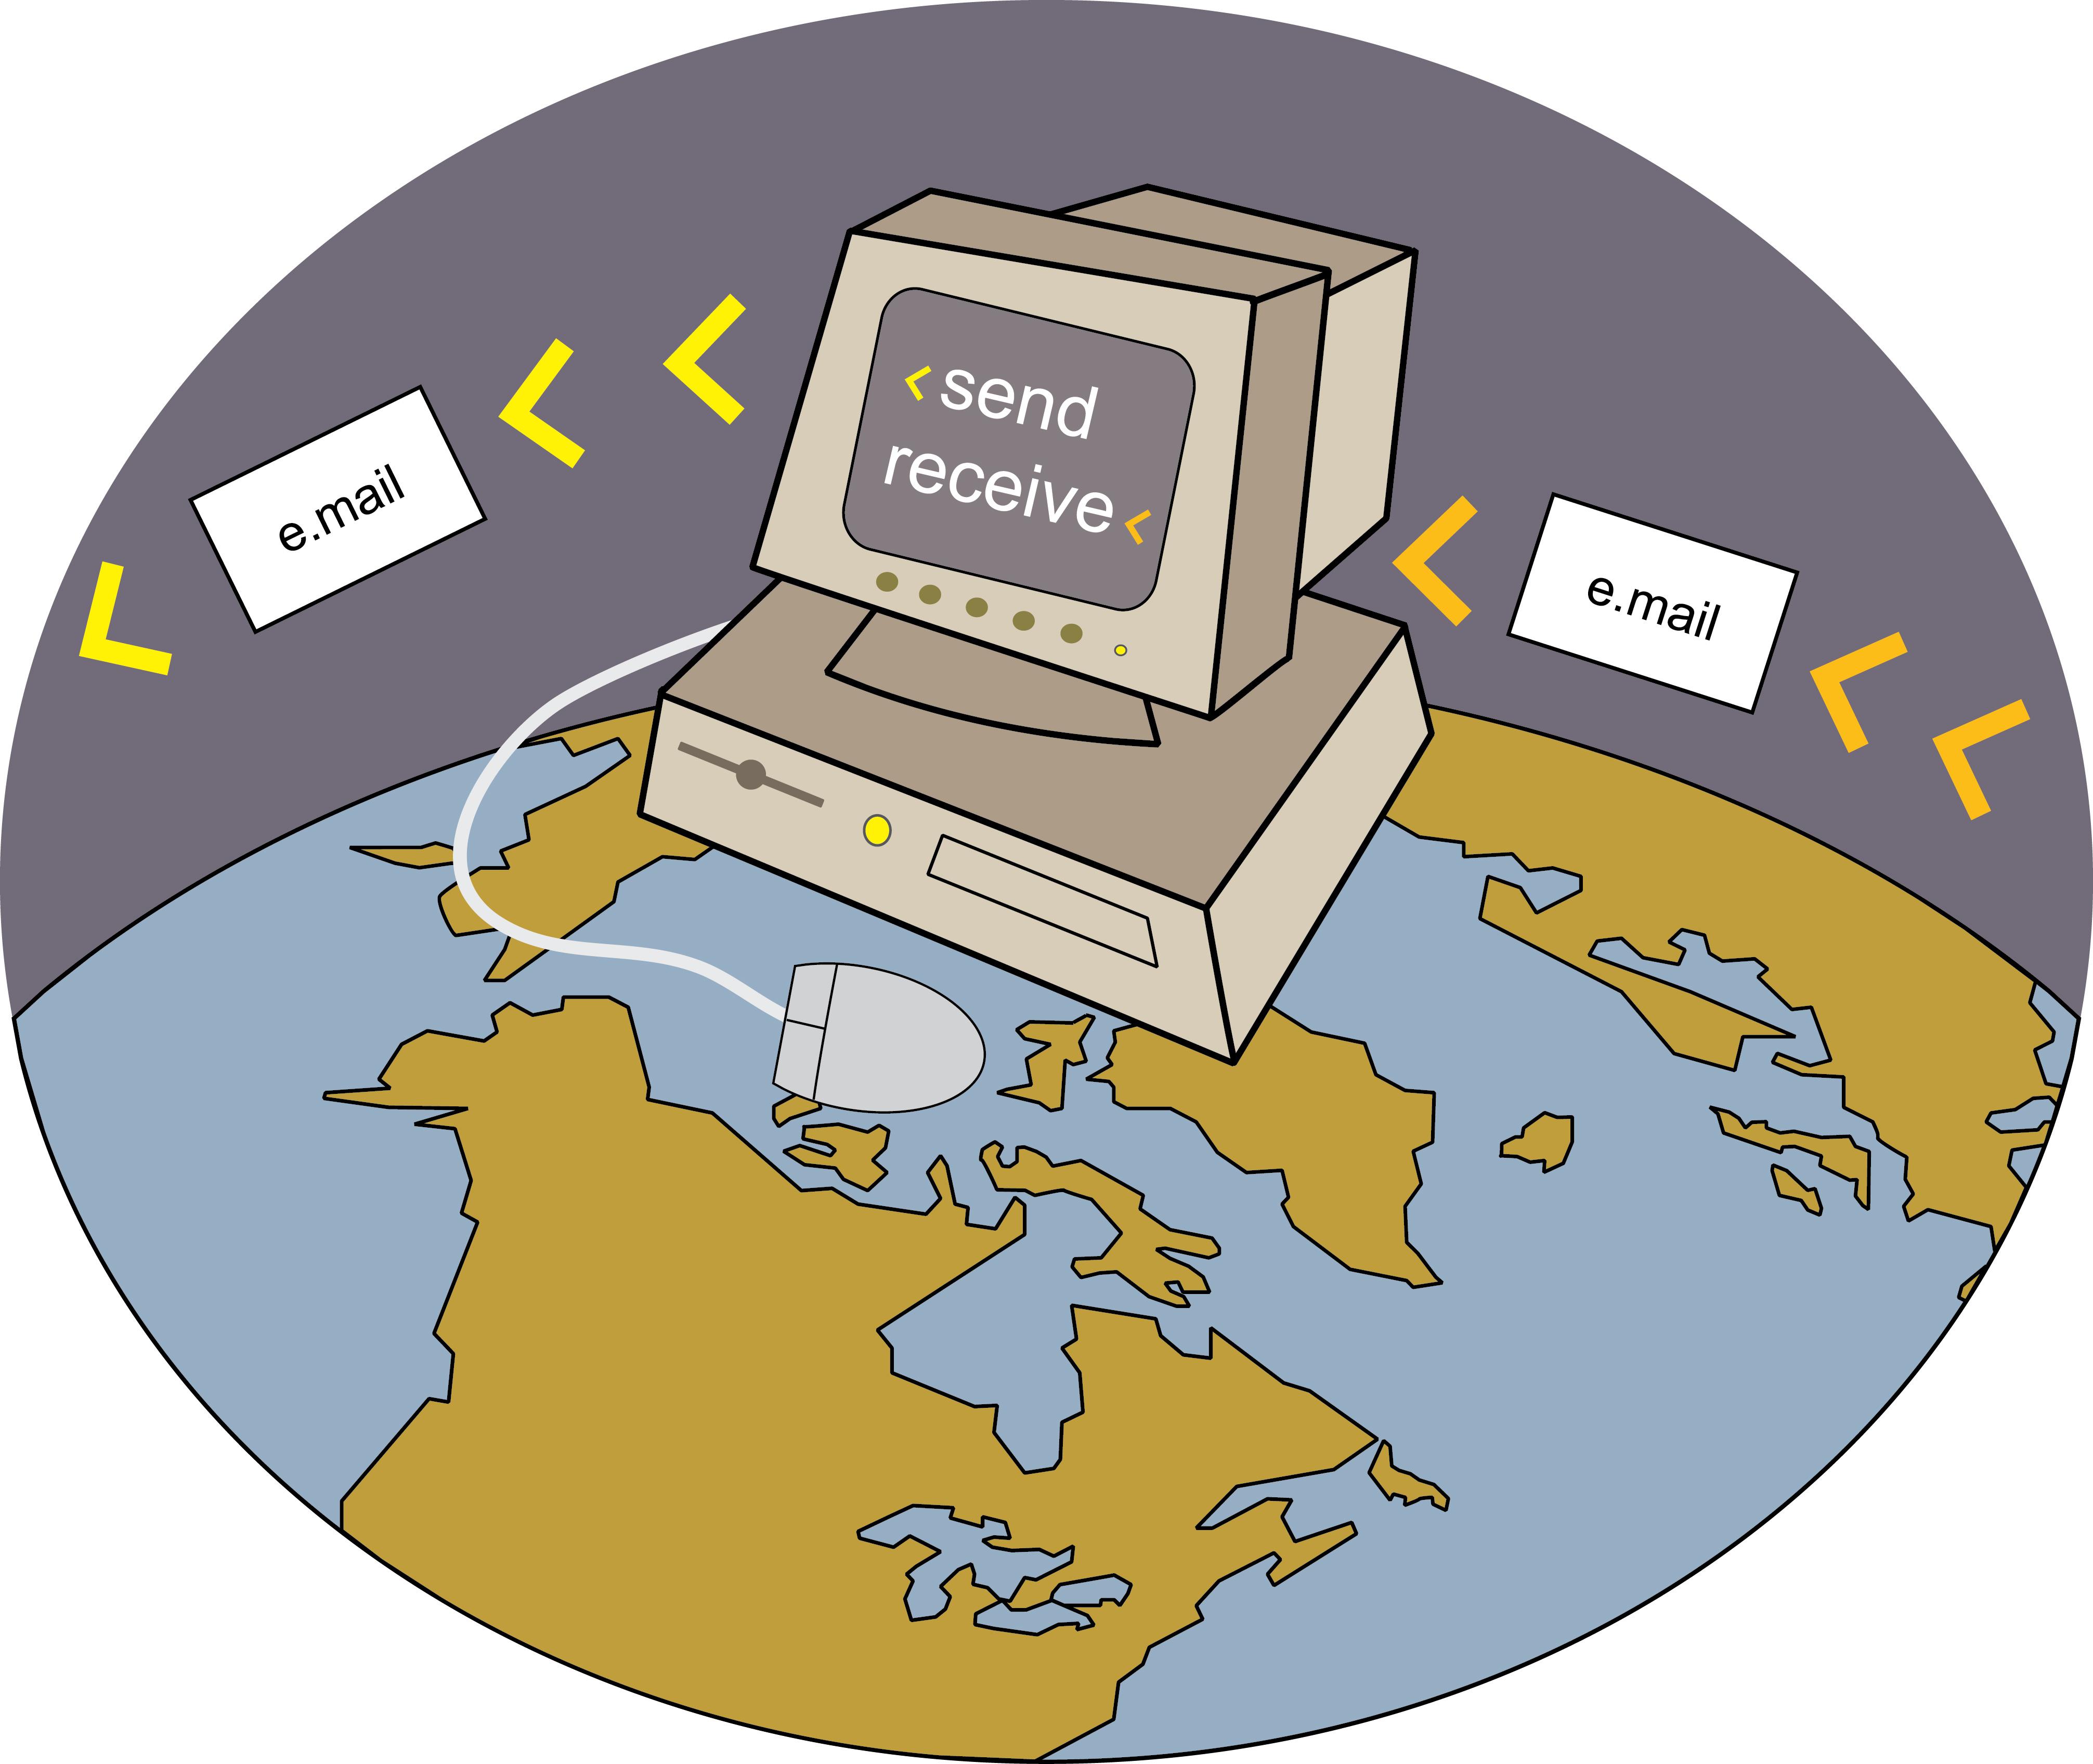 Le Top 11 des logiciels d'emailing, des logiciels d'emailing gratuits aux solutions d'emailing les plus performantes ! 10